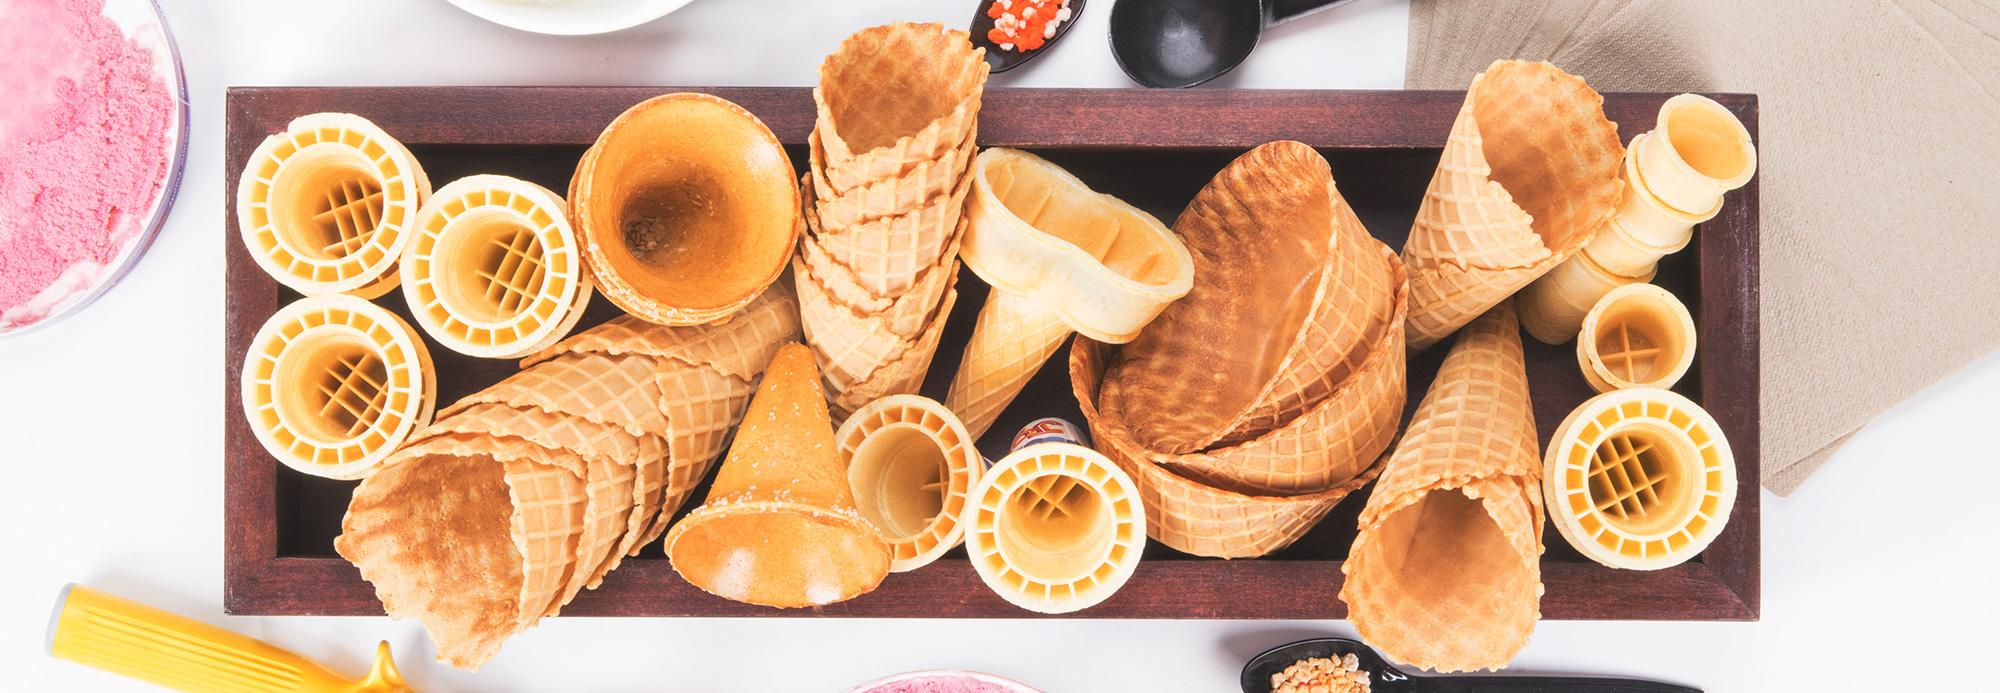 Different Types Of Ice Cream Cones Choosing The Best Ice